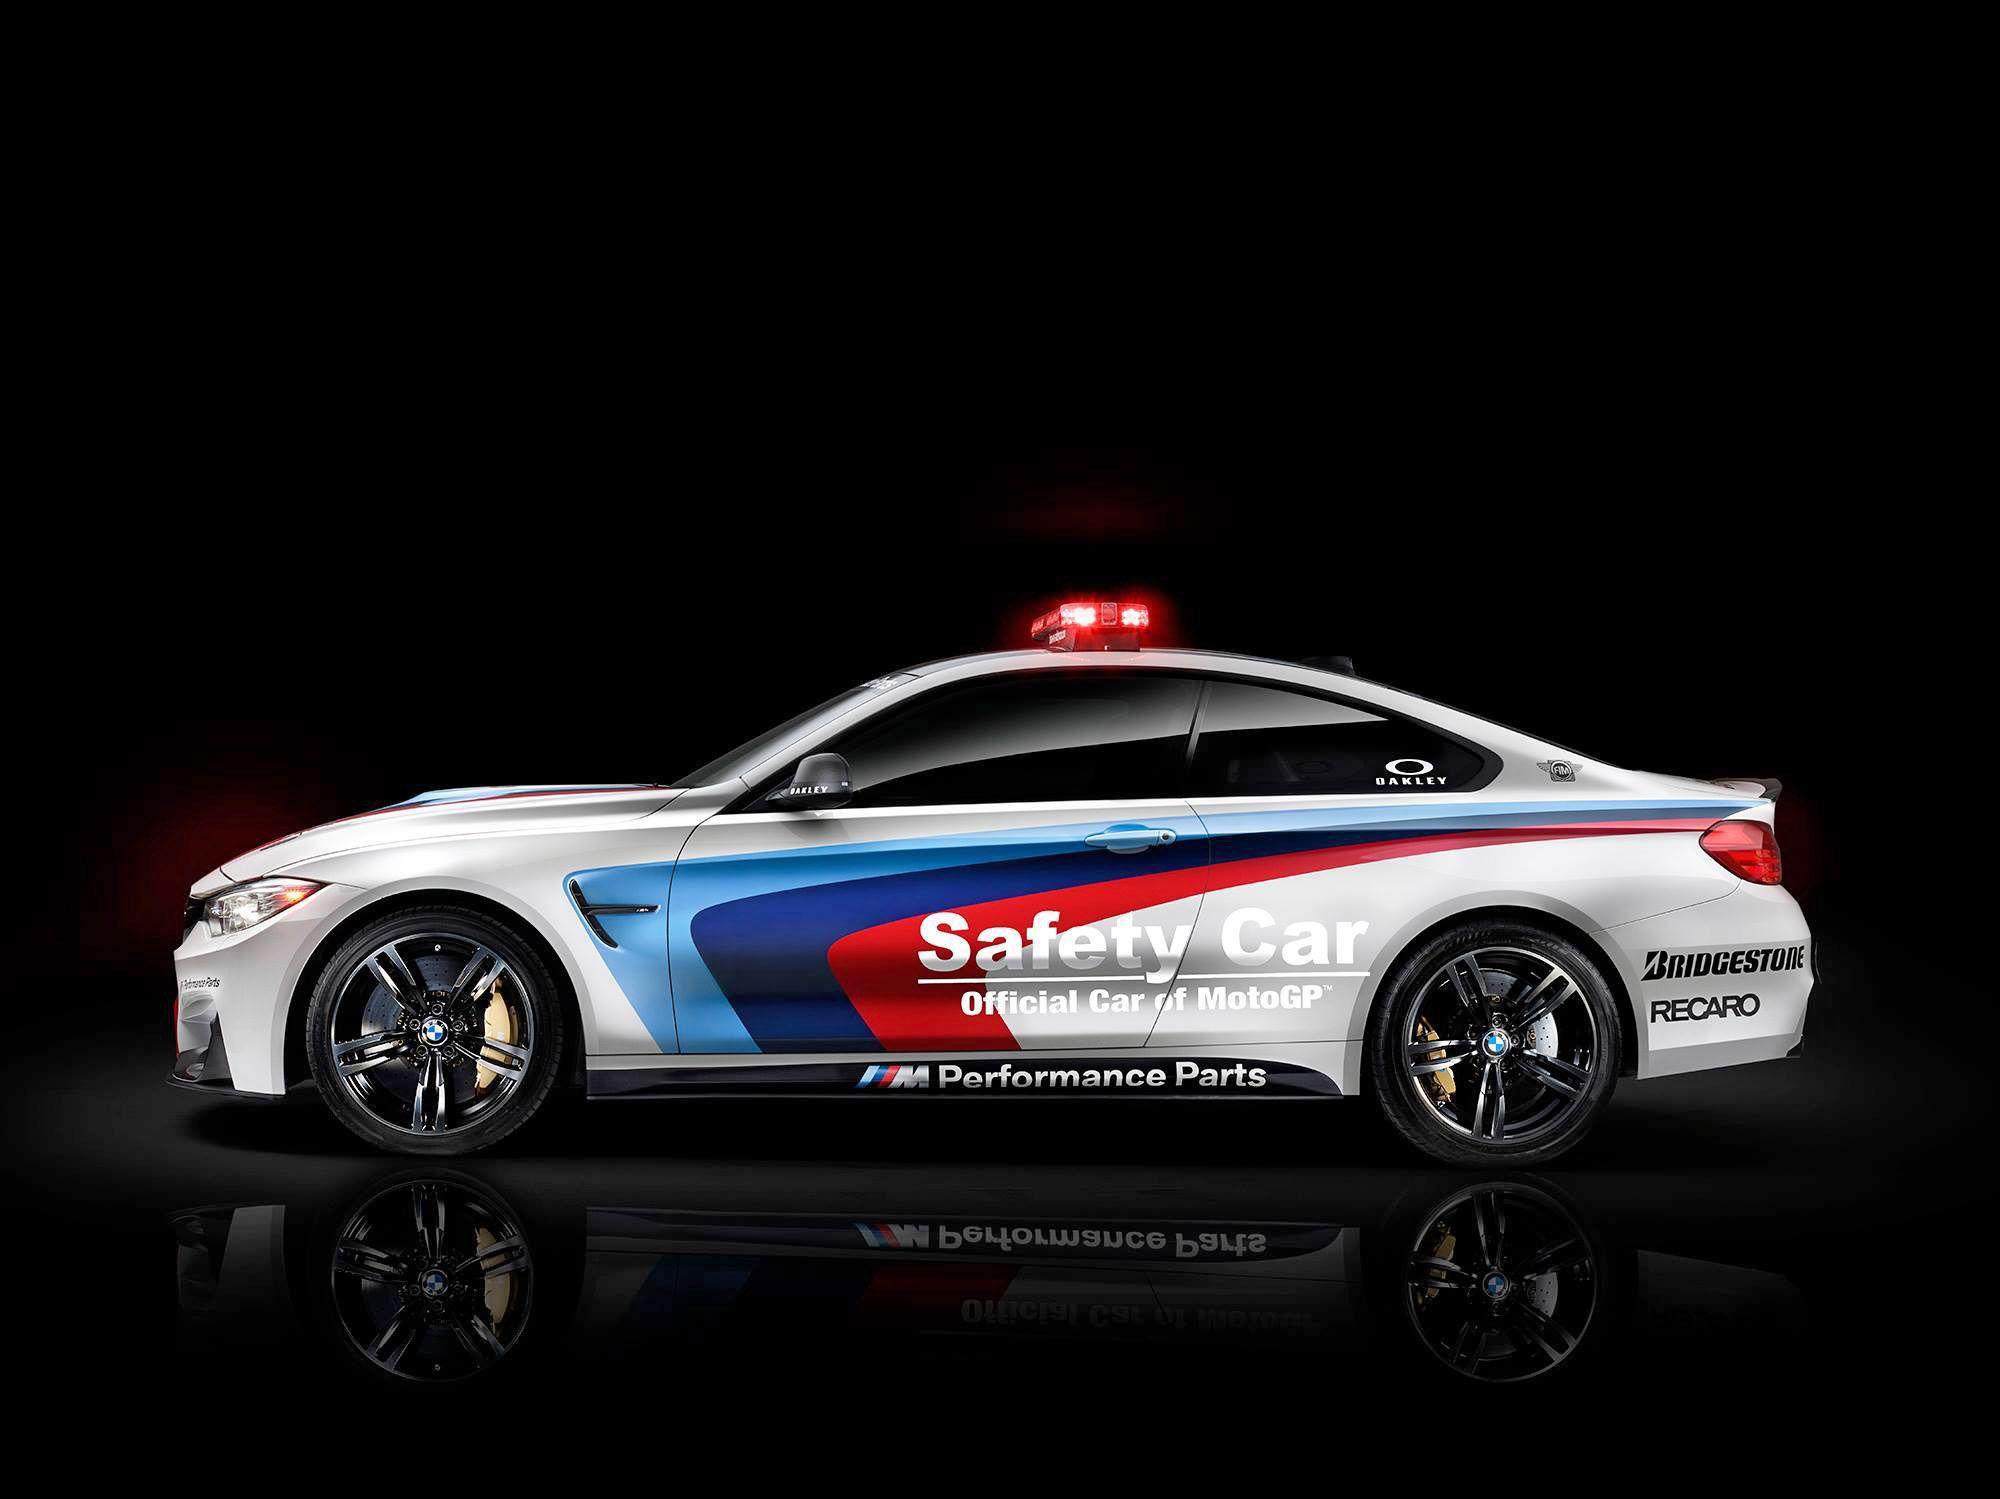 2014 BMW MotoGP M4 Safety Car BMW 4 Series